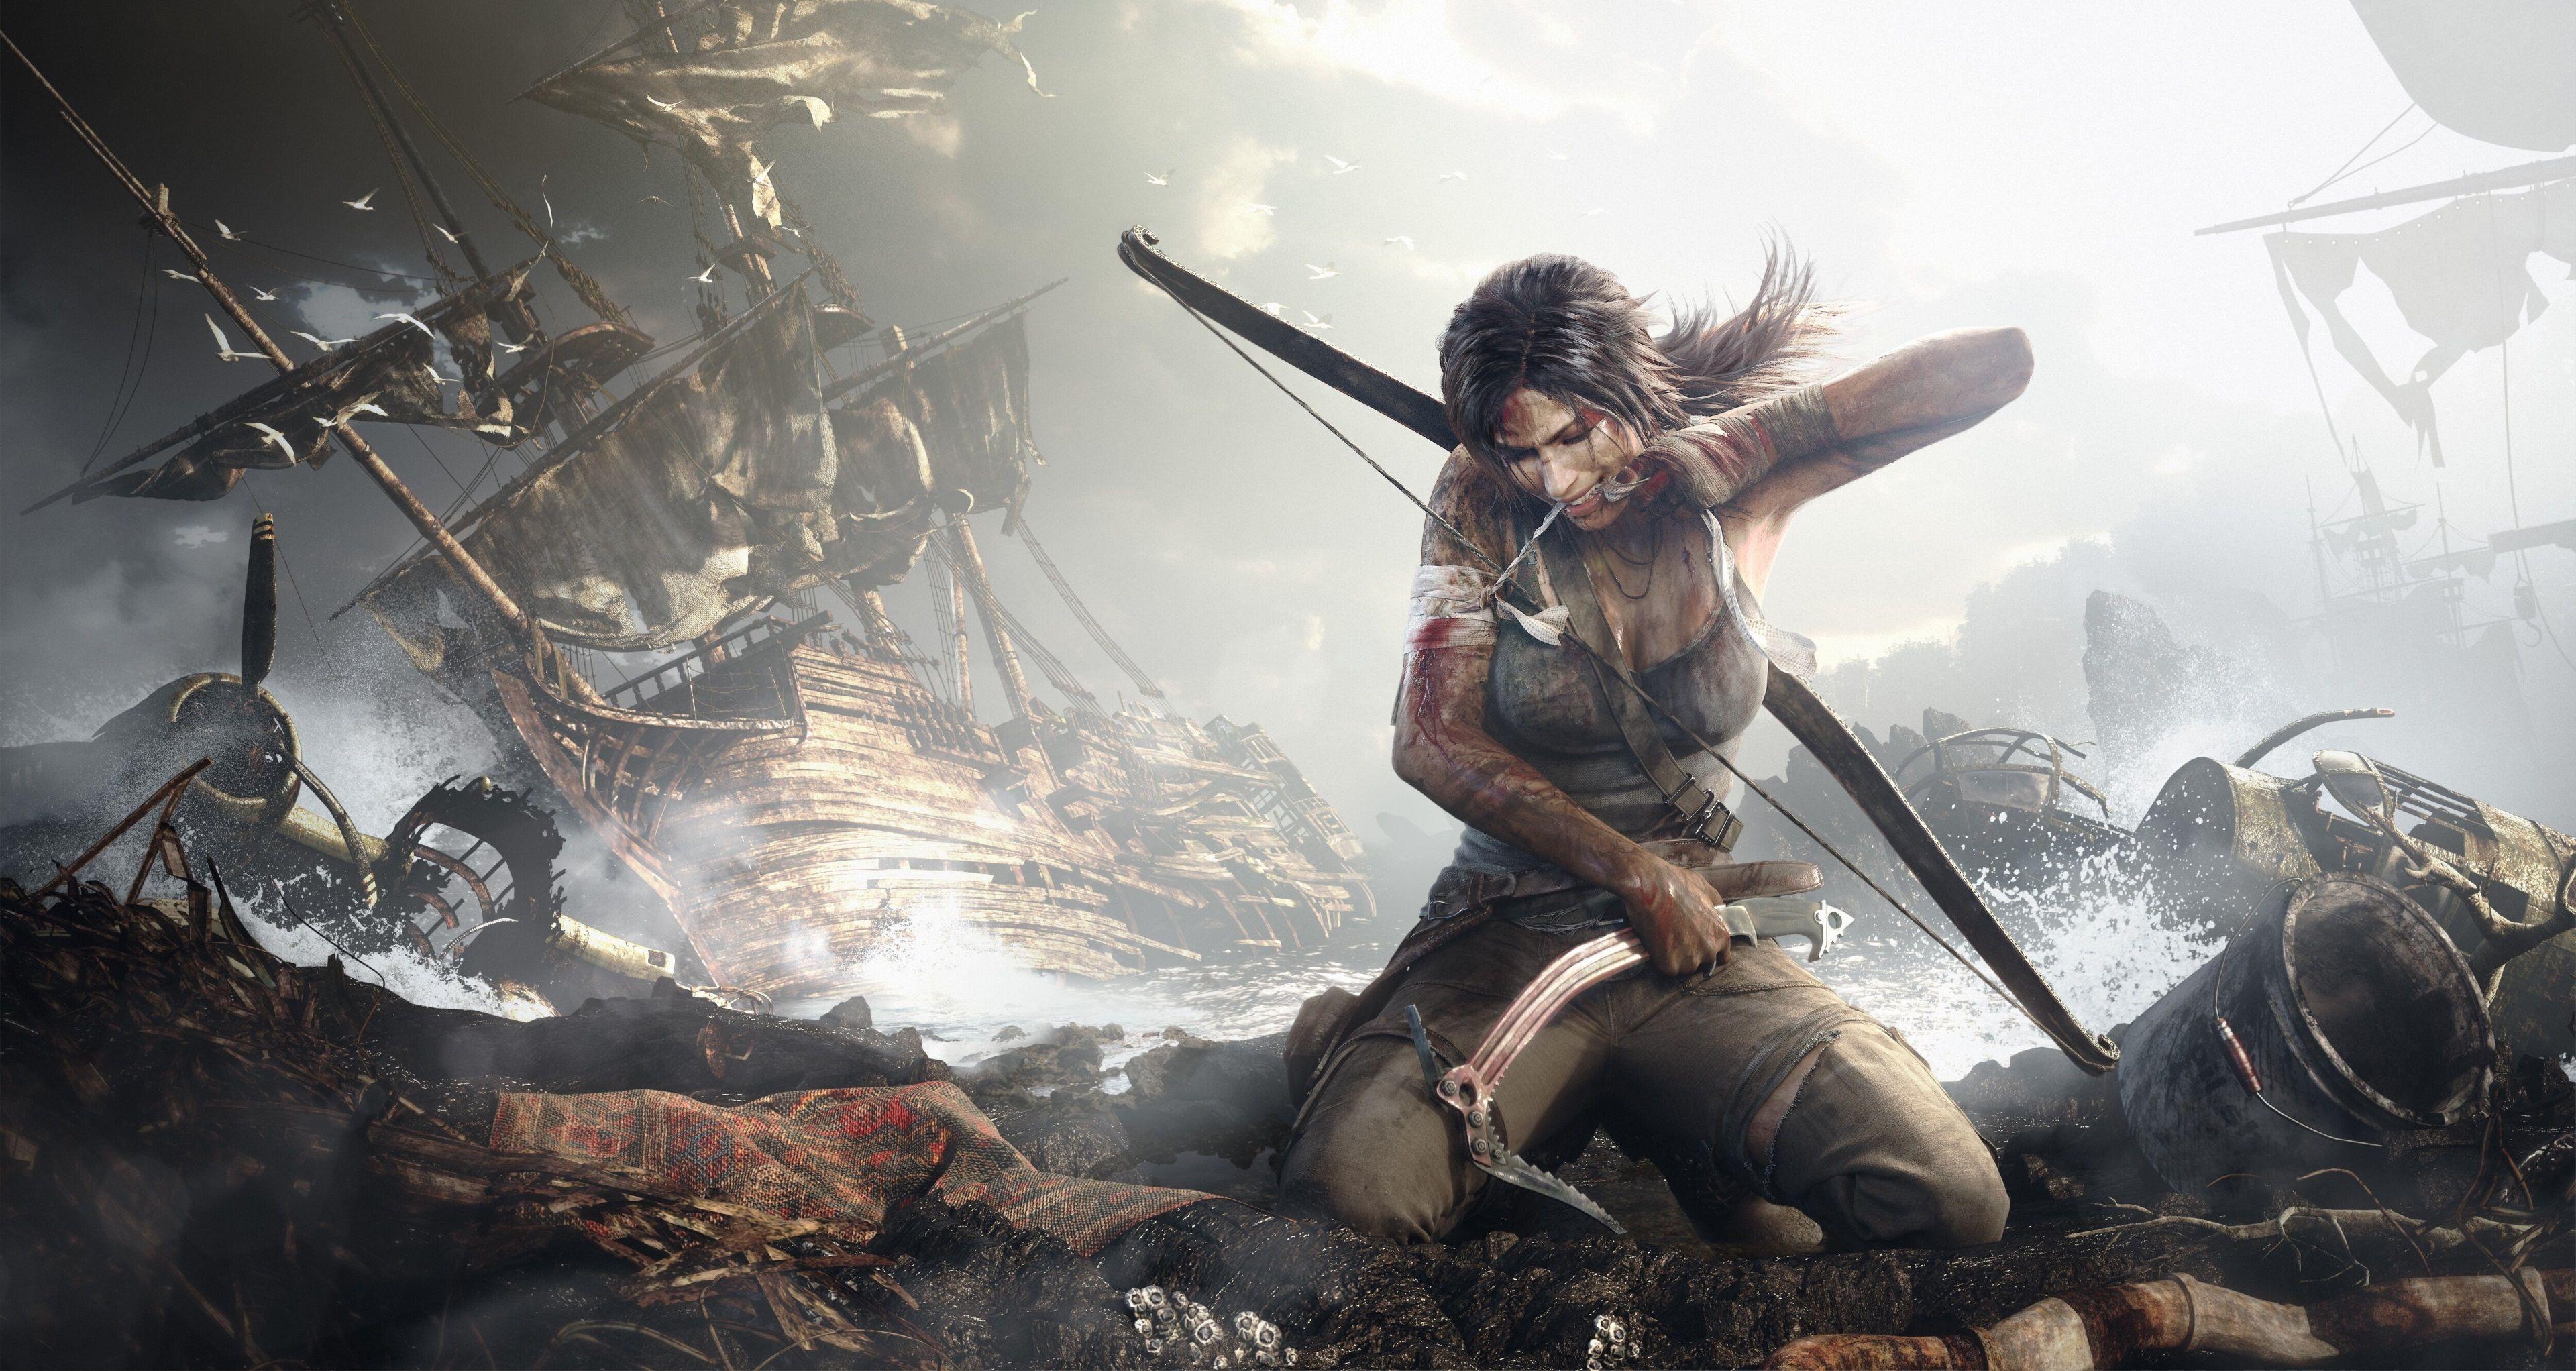 3840x2044 Rise Of The Tomb Raider 4k New Wallpaper Background Tomb Raider Wallpaper Tomb Raider 2013 New Tomb Raider